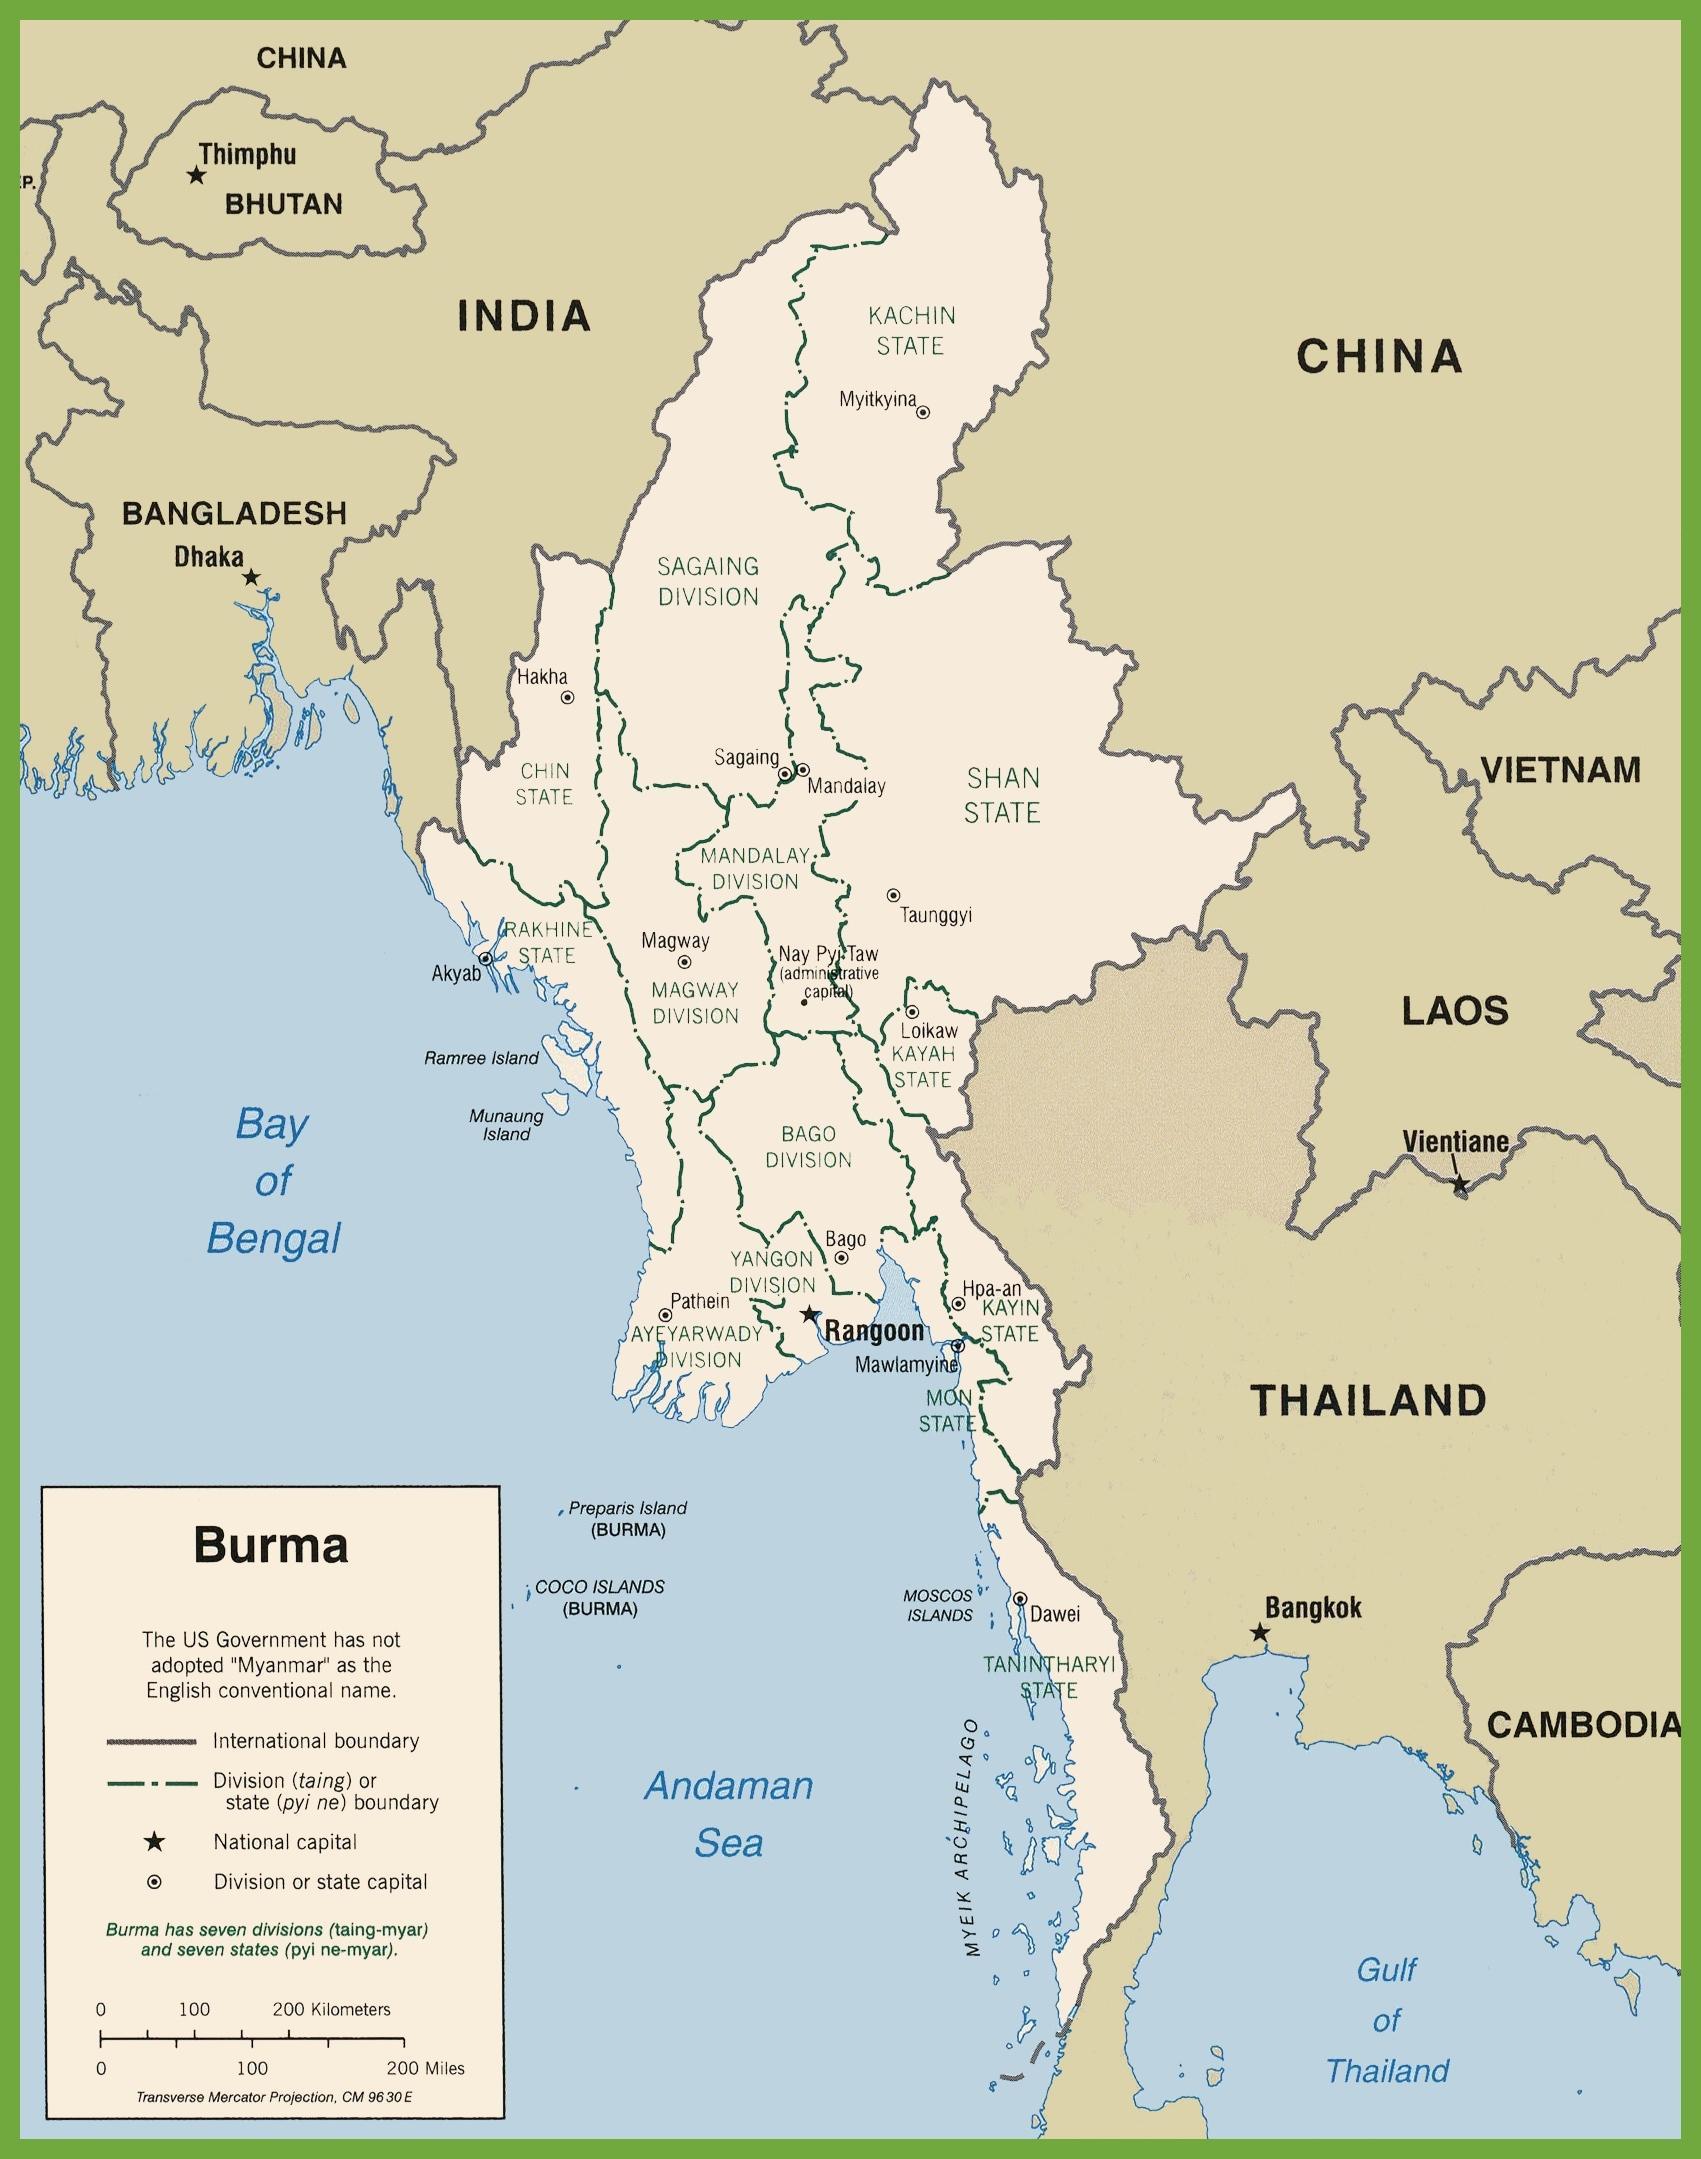 Myanmar political map - Burma political map (South-Eastern ... on bermuda map, senegal map, libya map, eritrea map, usa map, china map, north sea map, kenya map, croatia map, india map, ghana map, ethiopia map, madagascar map, armenia map, rwanda map, algeria map, papua new guinea map, sudan map, andaman islands map, cameroon map, burundi map, niger map, angola map, mongolia map, zimbabwe map, japan map, uganda map, germany map, morocco map, myanmar map, iran map, iceland map, pakistan map, mozambique map, southeast asia map, lesotho map, tunisia map, central asia map, cape of good hope map,